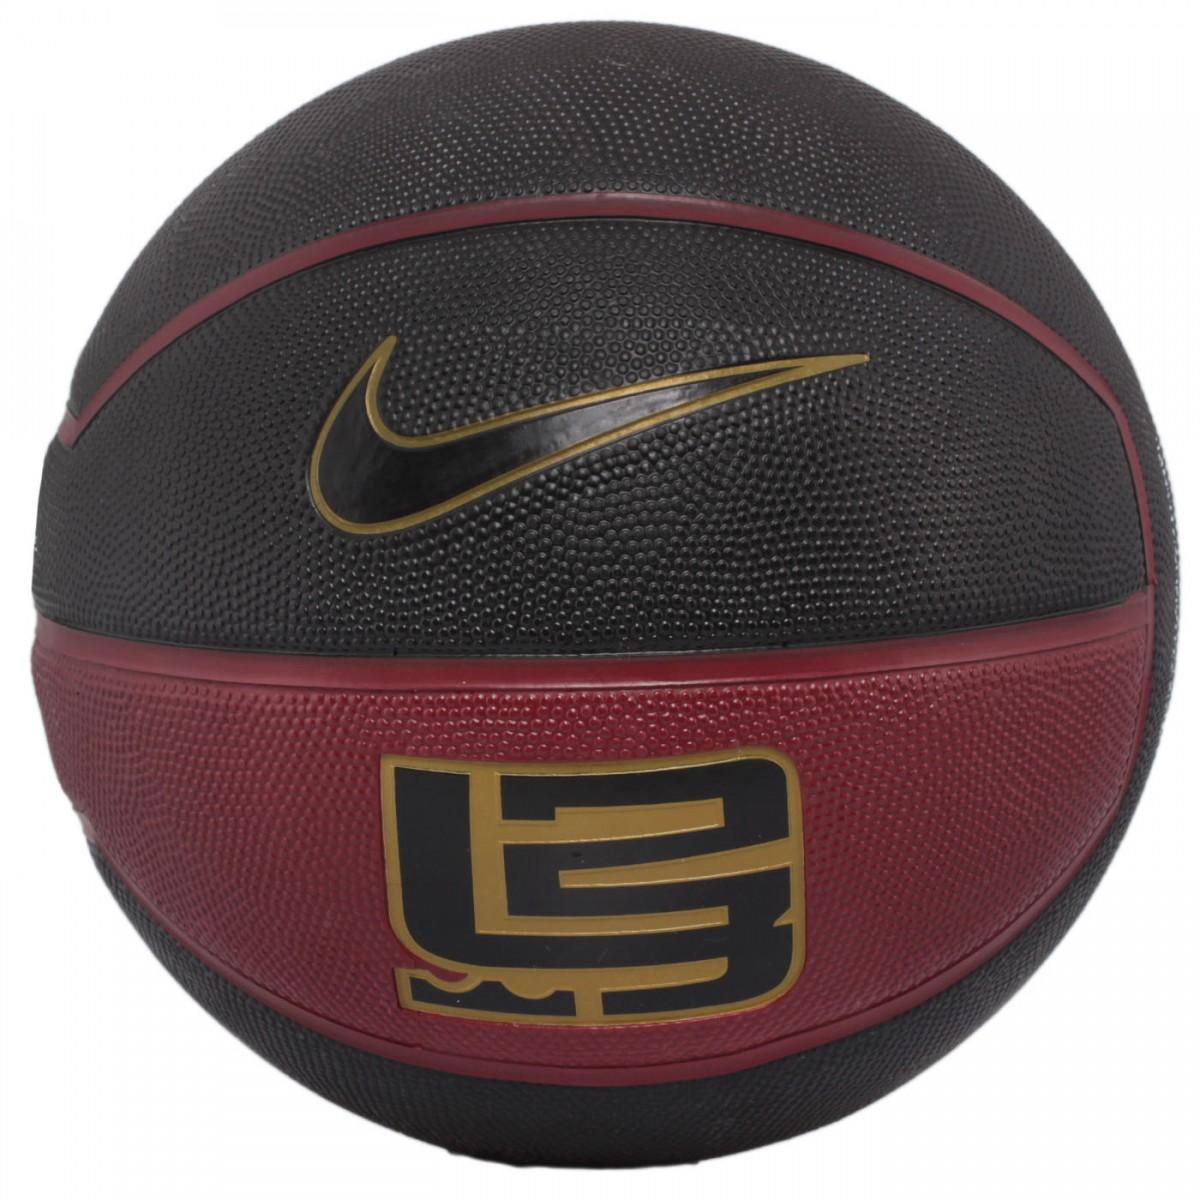 5163a1f723ce7 Bola Nike Basquete Lebron V Playground